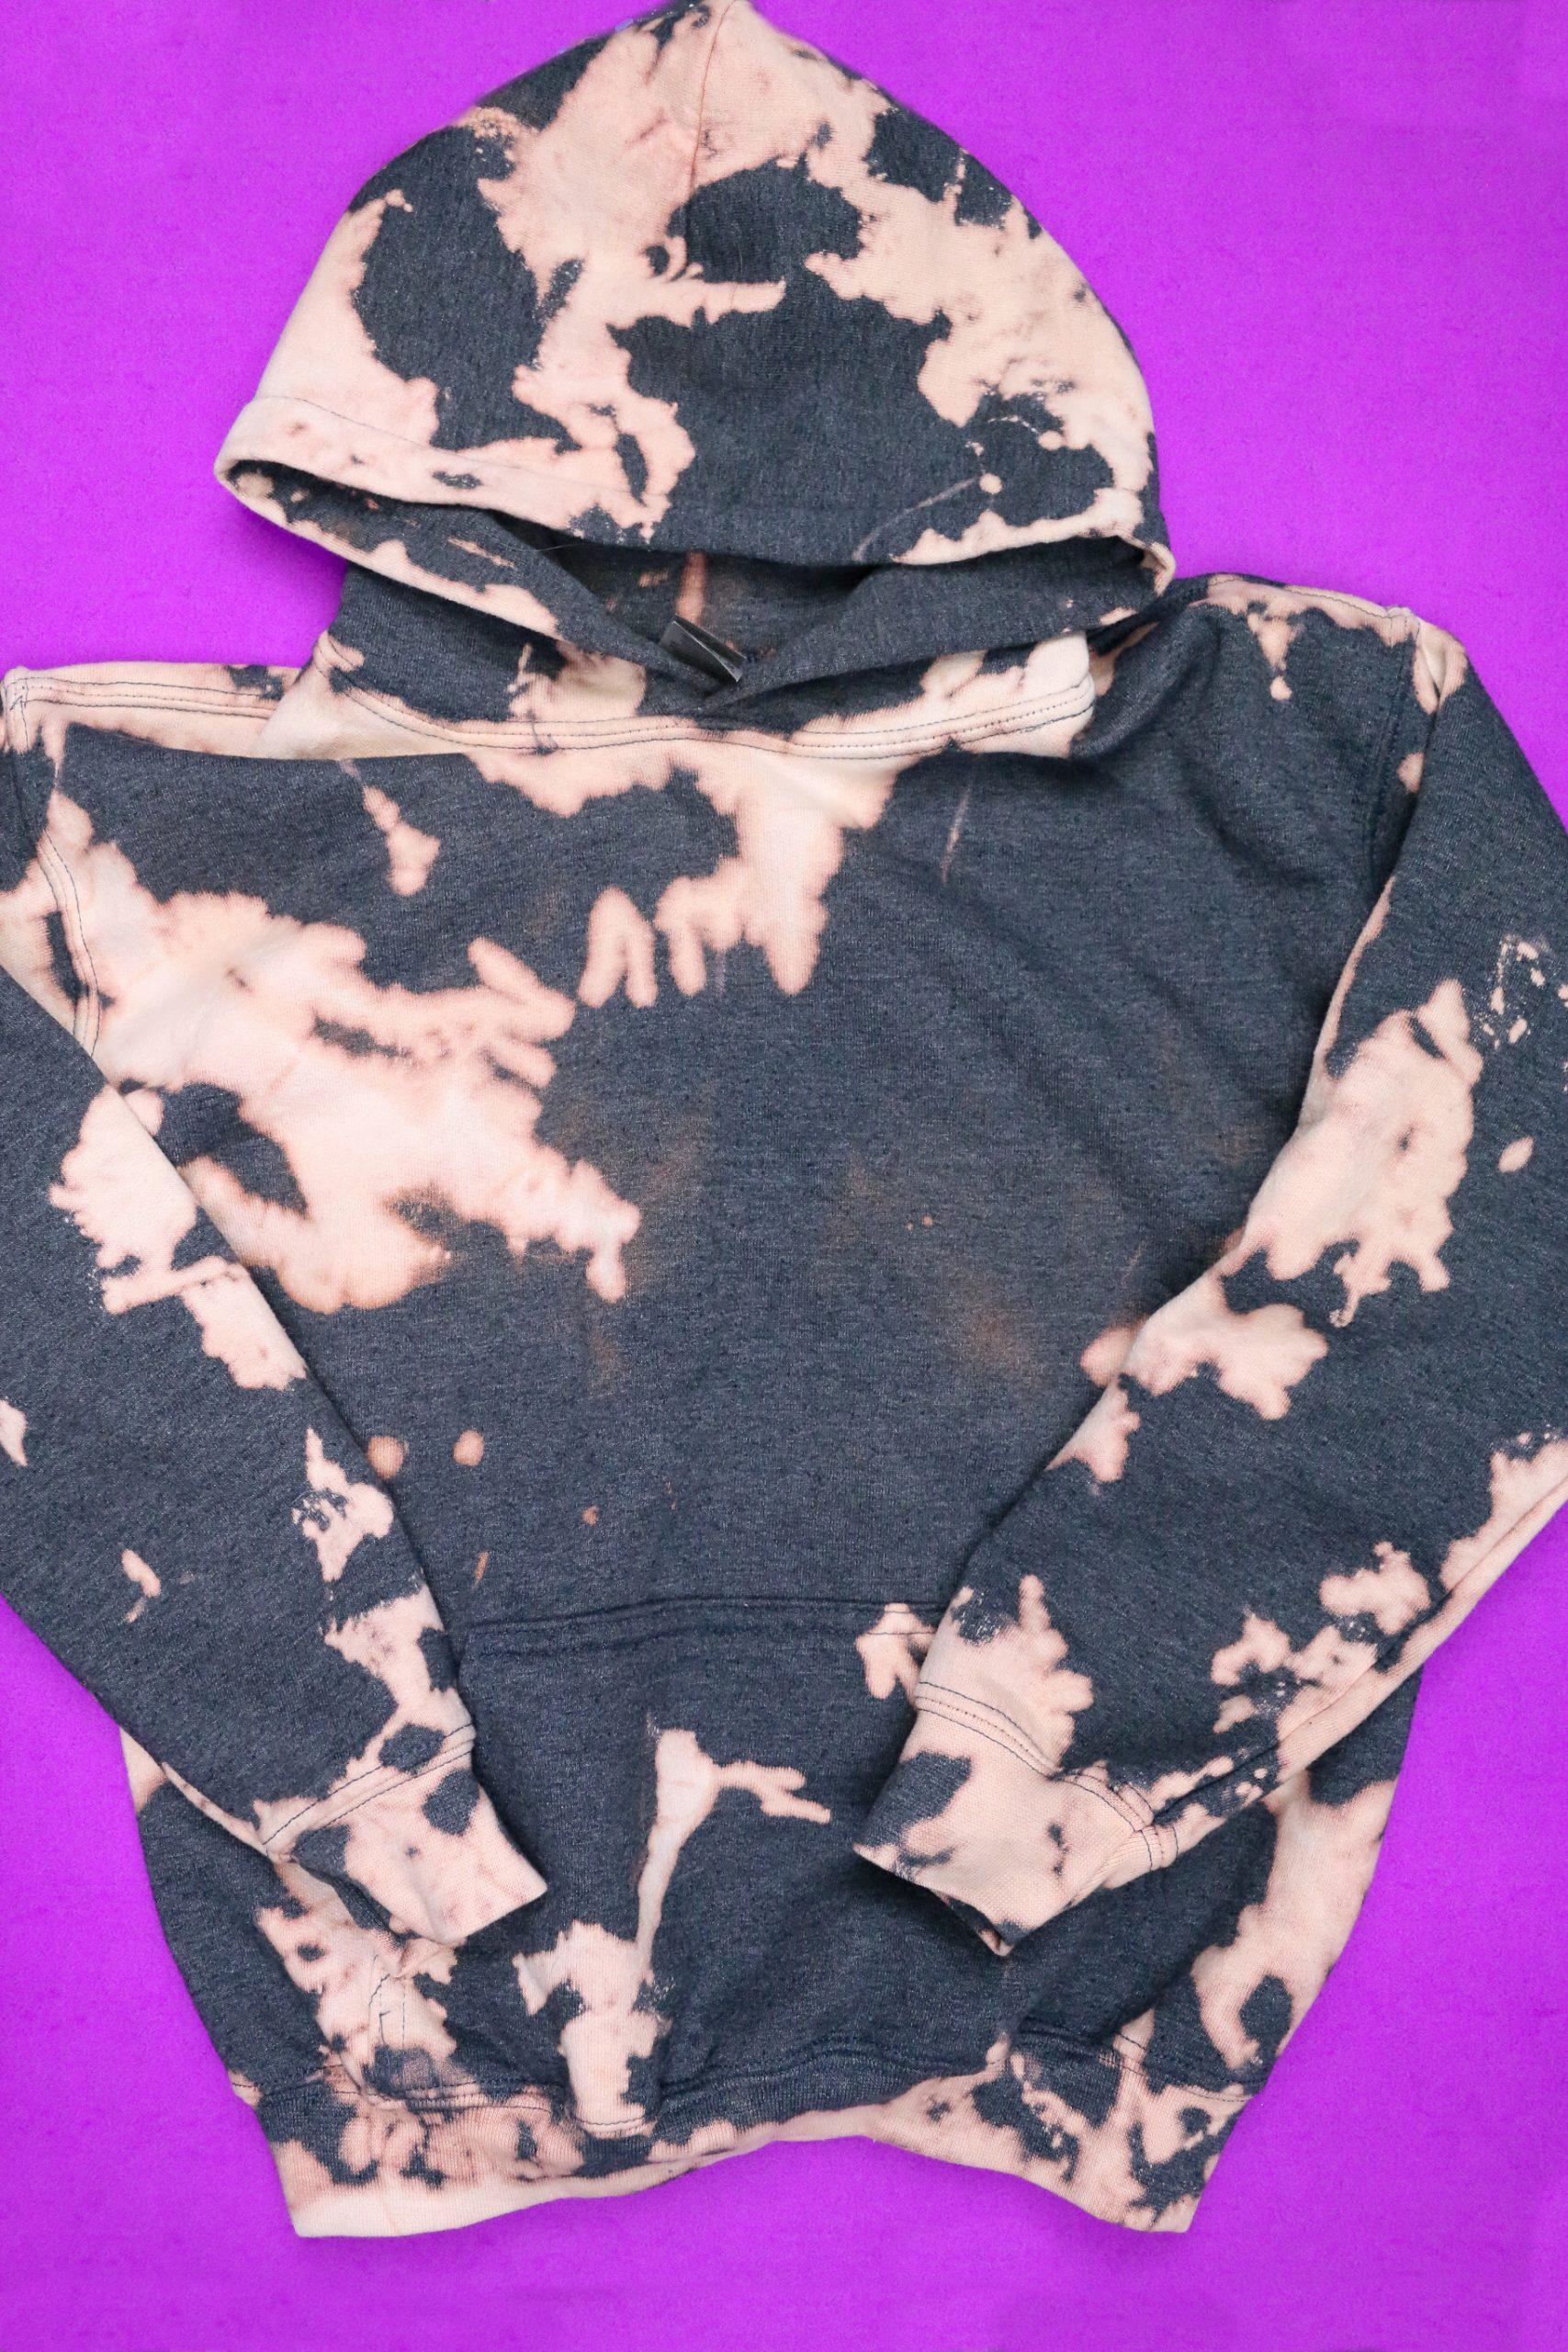 Grey bleach dyed sweatshirt on purple background